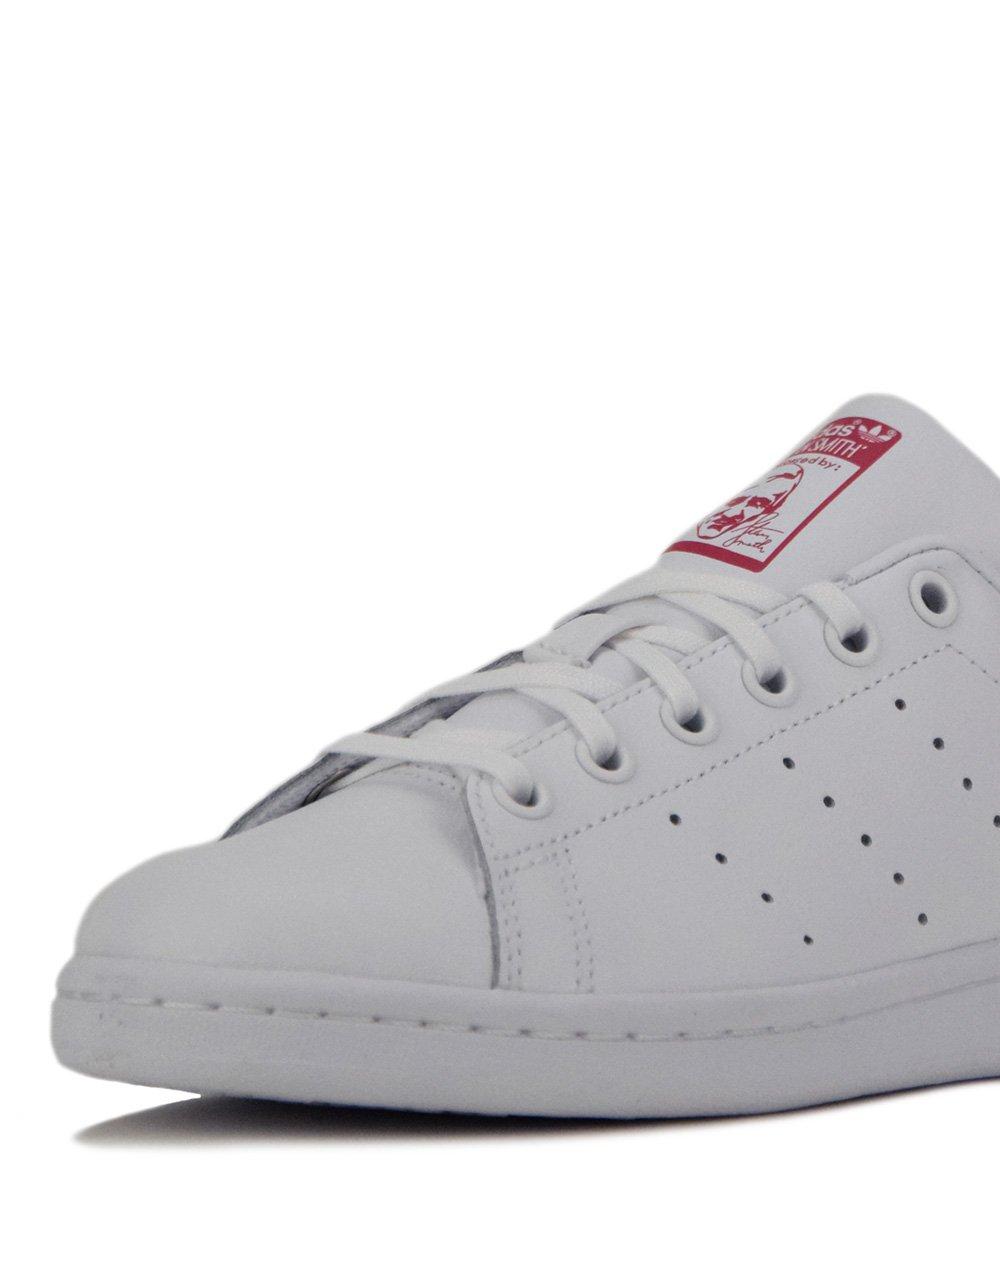 Adidas Stan Smith J (B32703) White/Pink